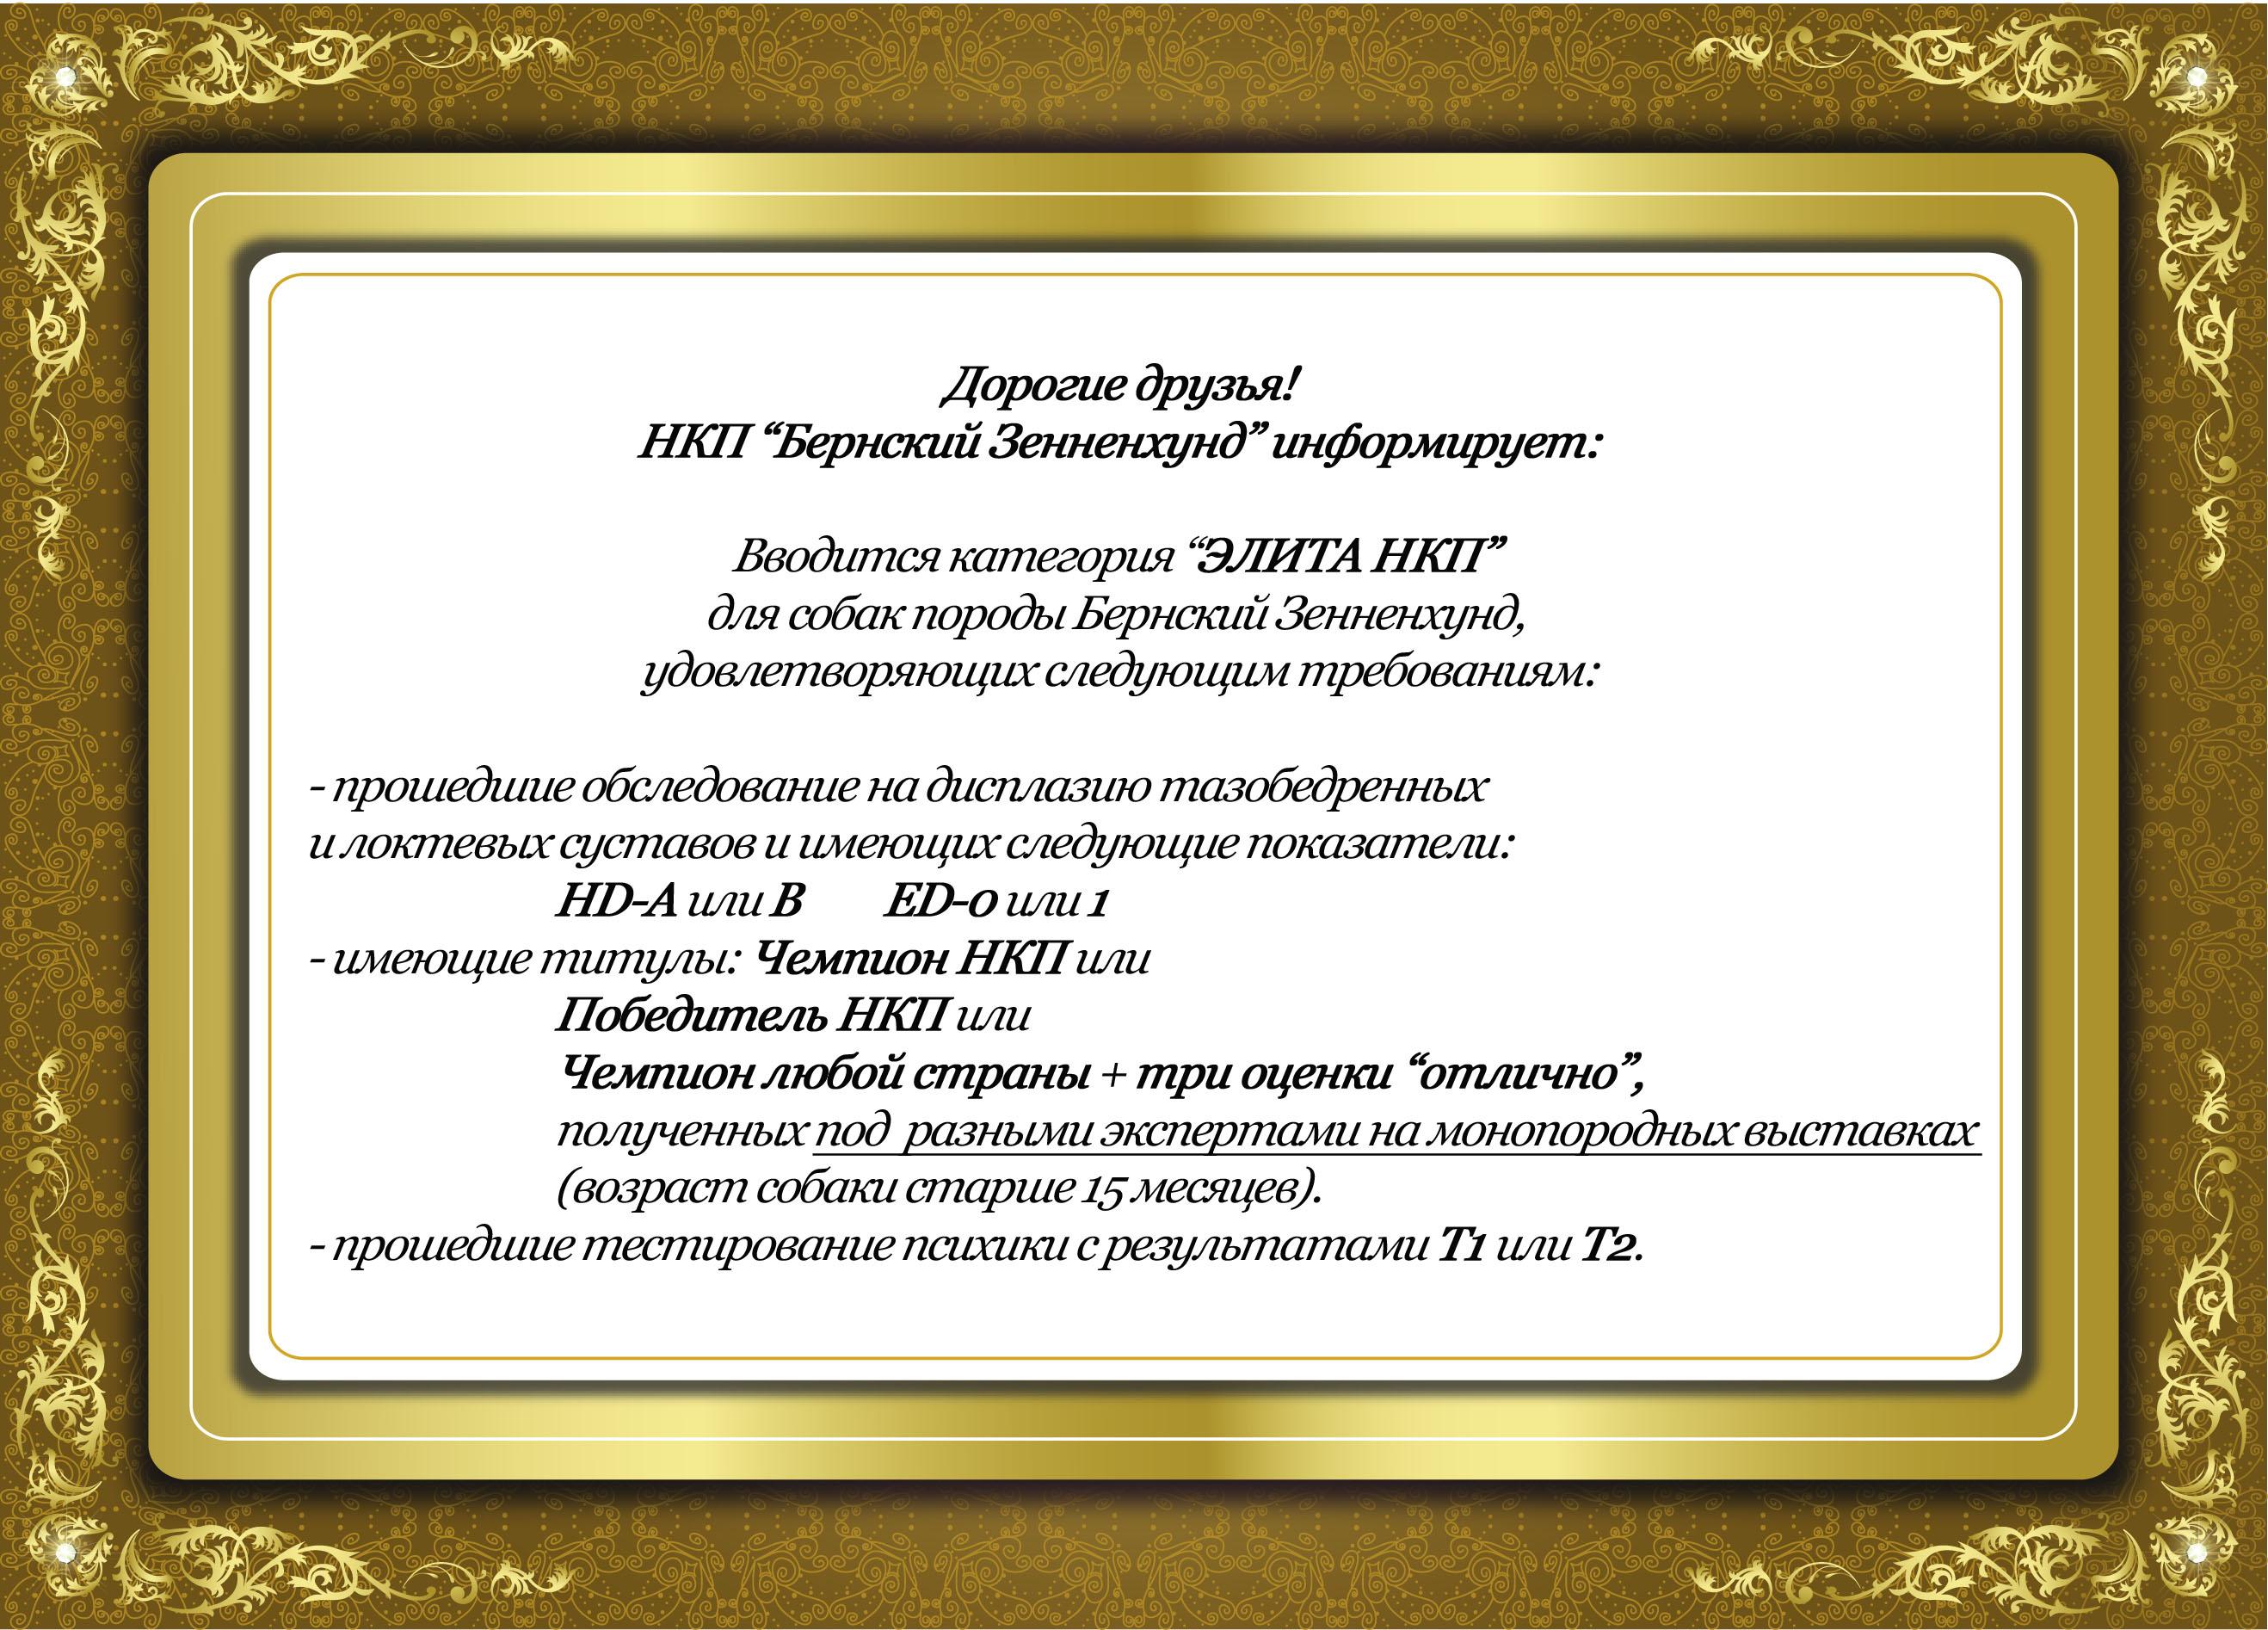 http://bern-sennenhund.ru/images/Elita_NKP_gold.jpg